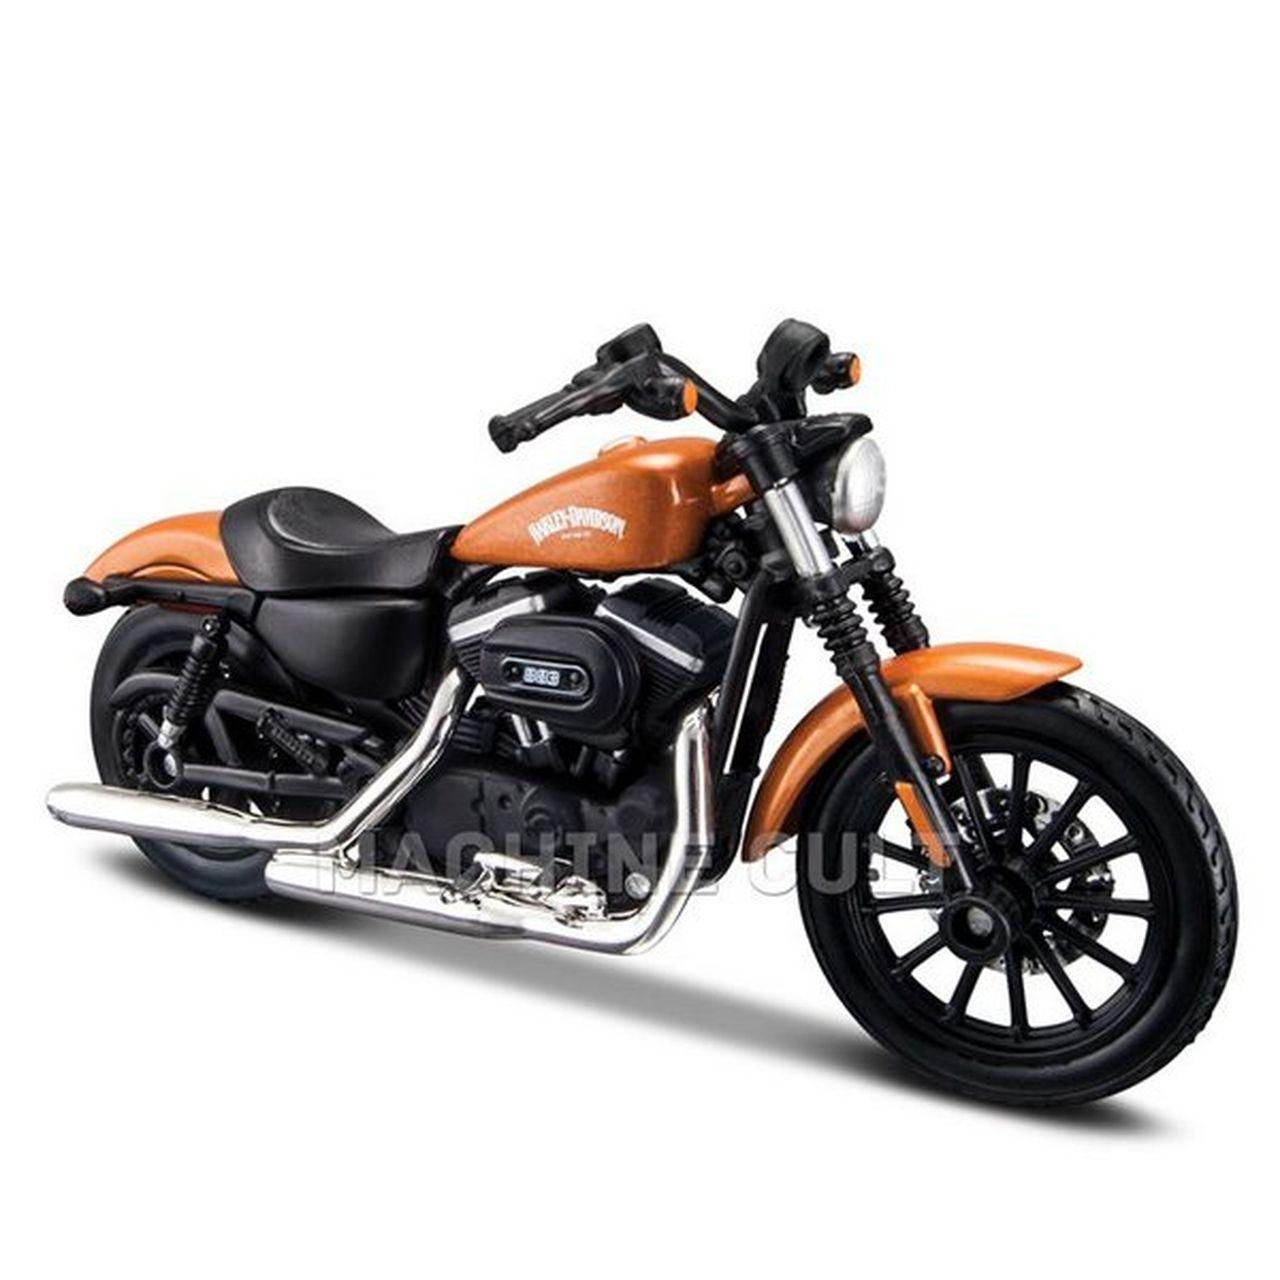 Miniatura Moto 2014 Sportster Iron 883: Harley Davidson (Serie 34) Escala 1/18 - Maisco